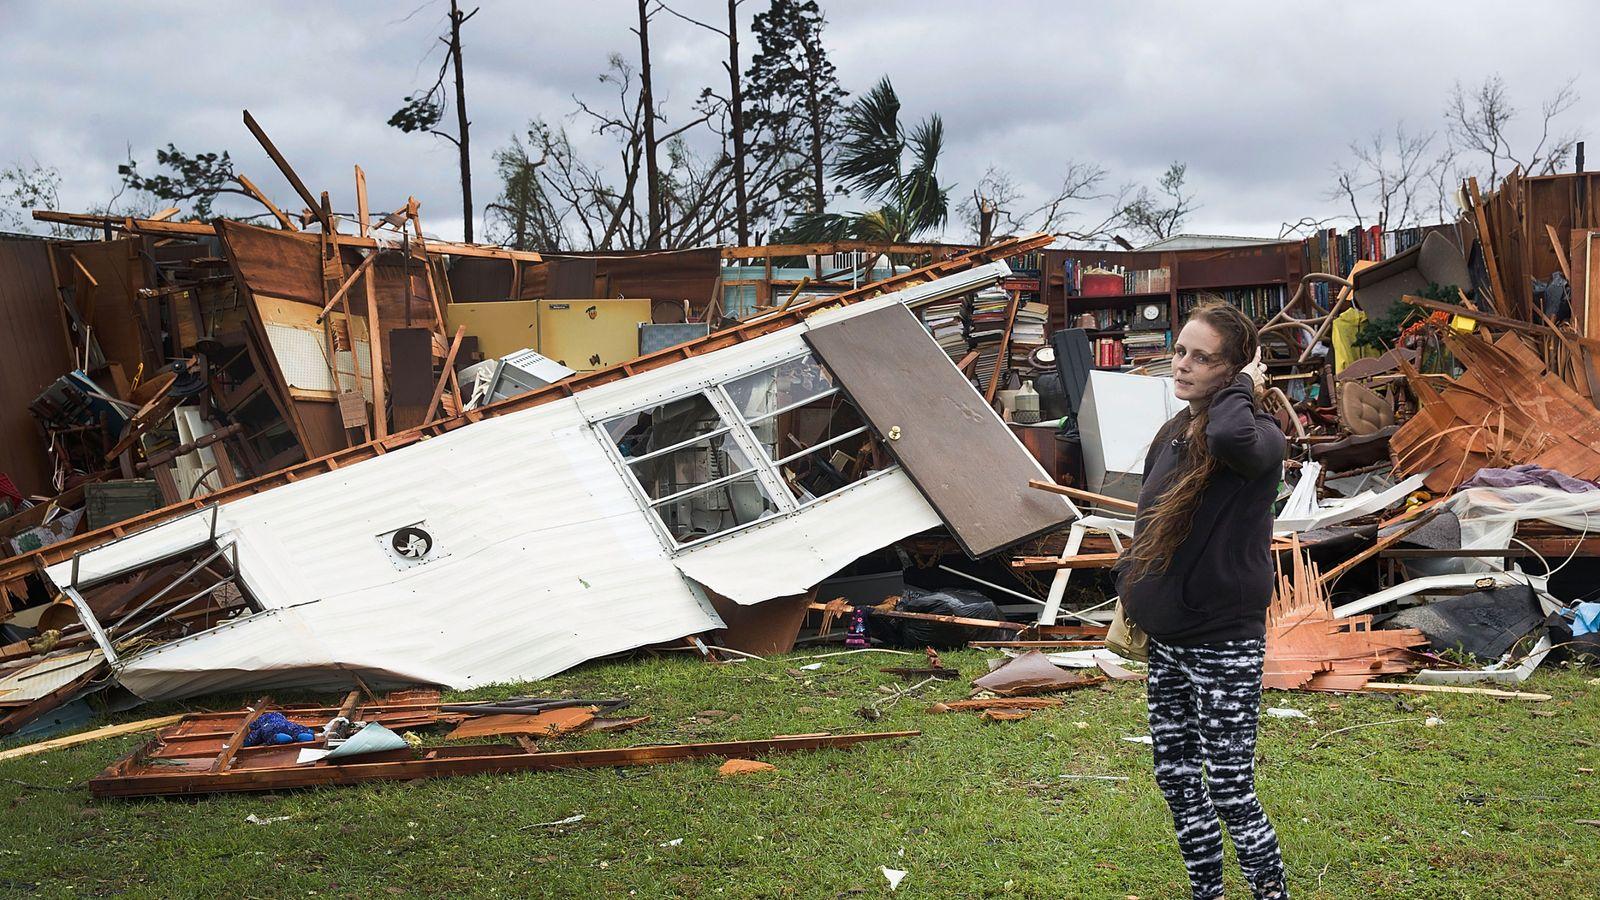 Hurricane Michael: Girl, 11, dies as tree falls on home